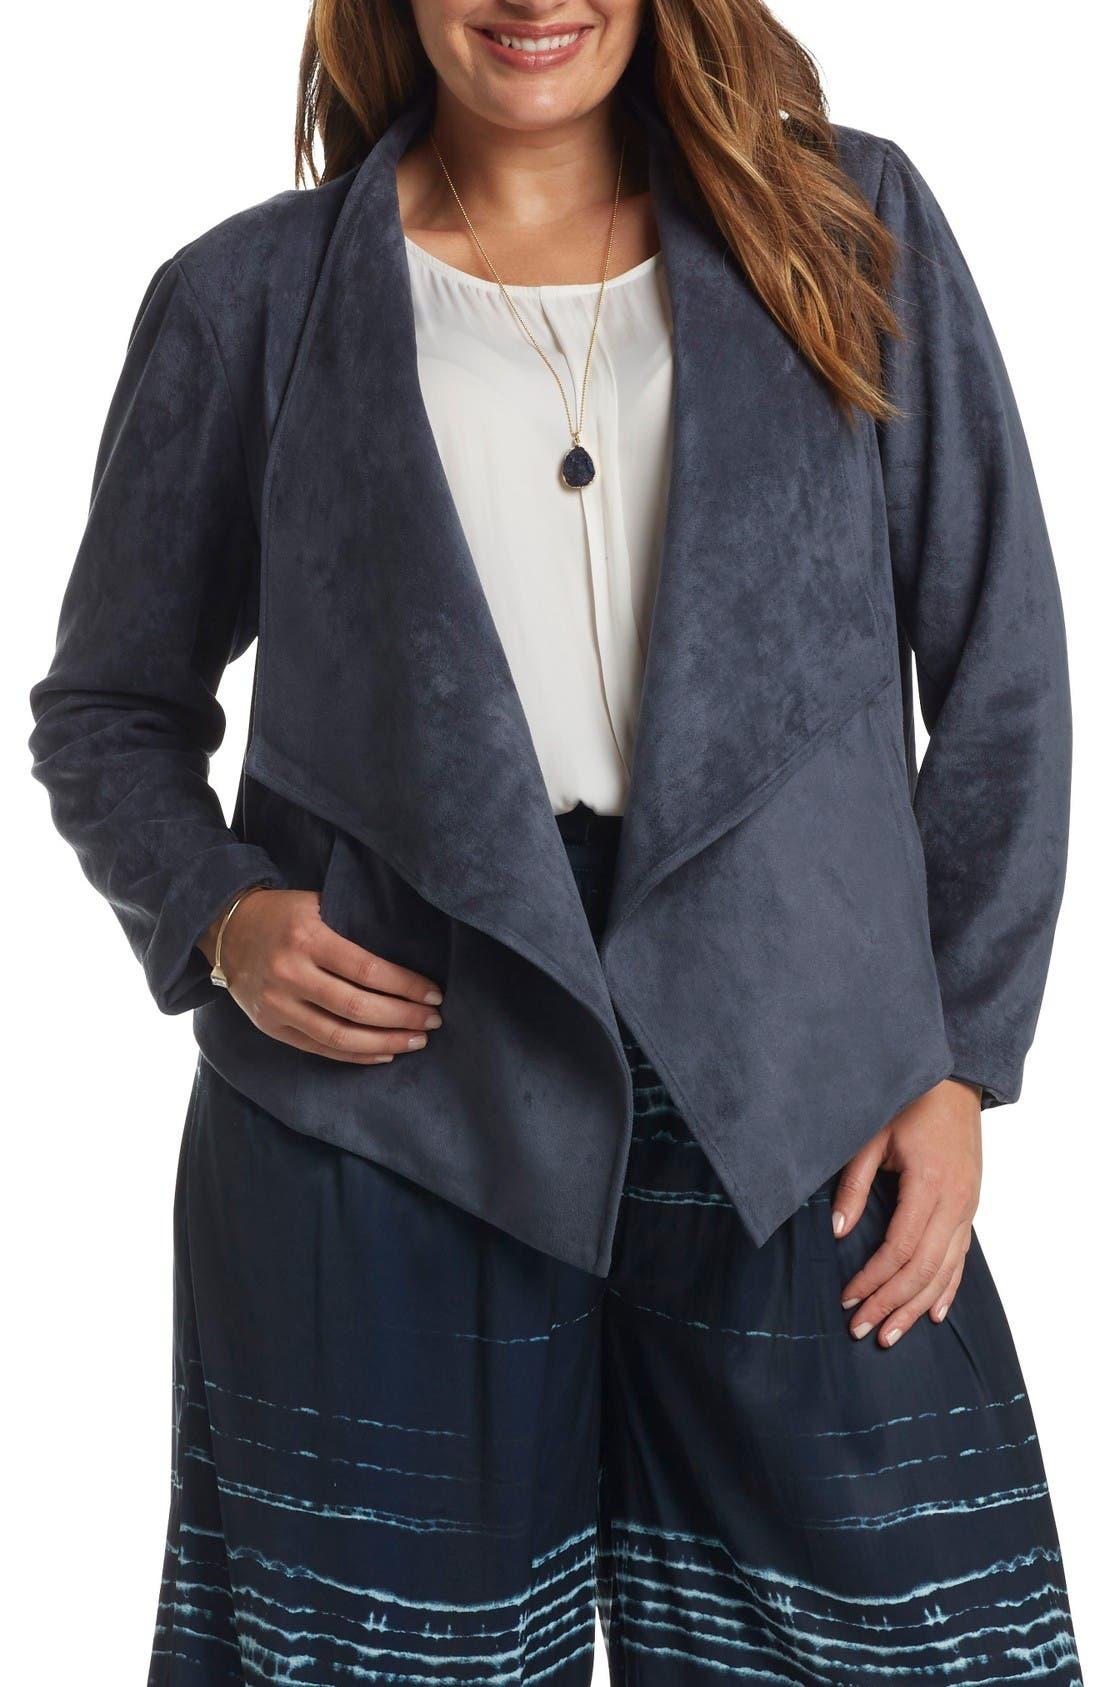 Alternate Image 1 Selected - Tart Sybil Faux Suede Drape Front Jacket (Plus Size)